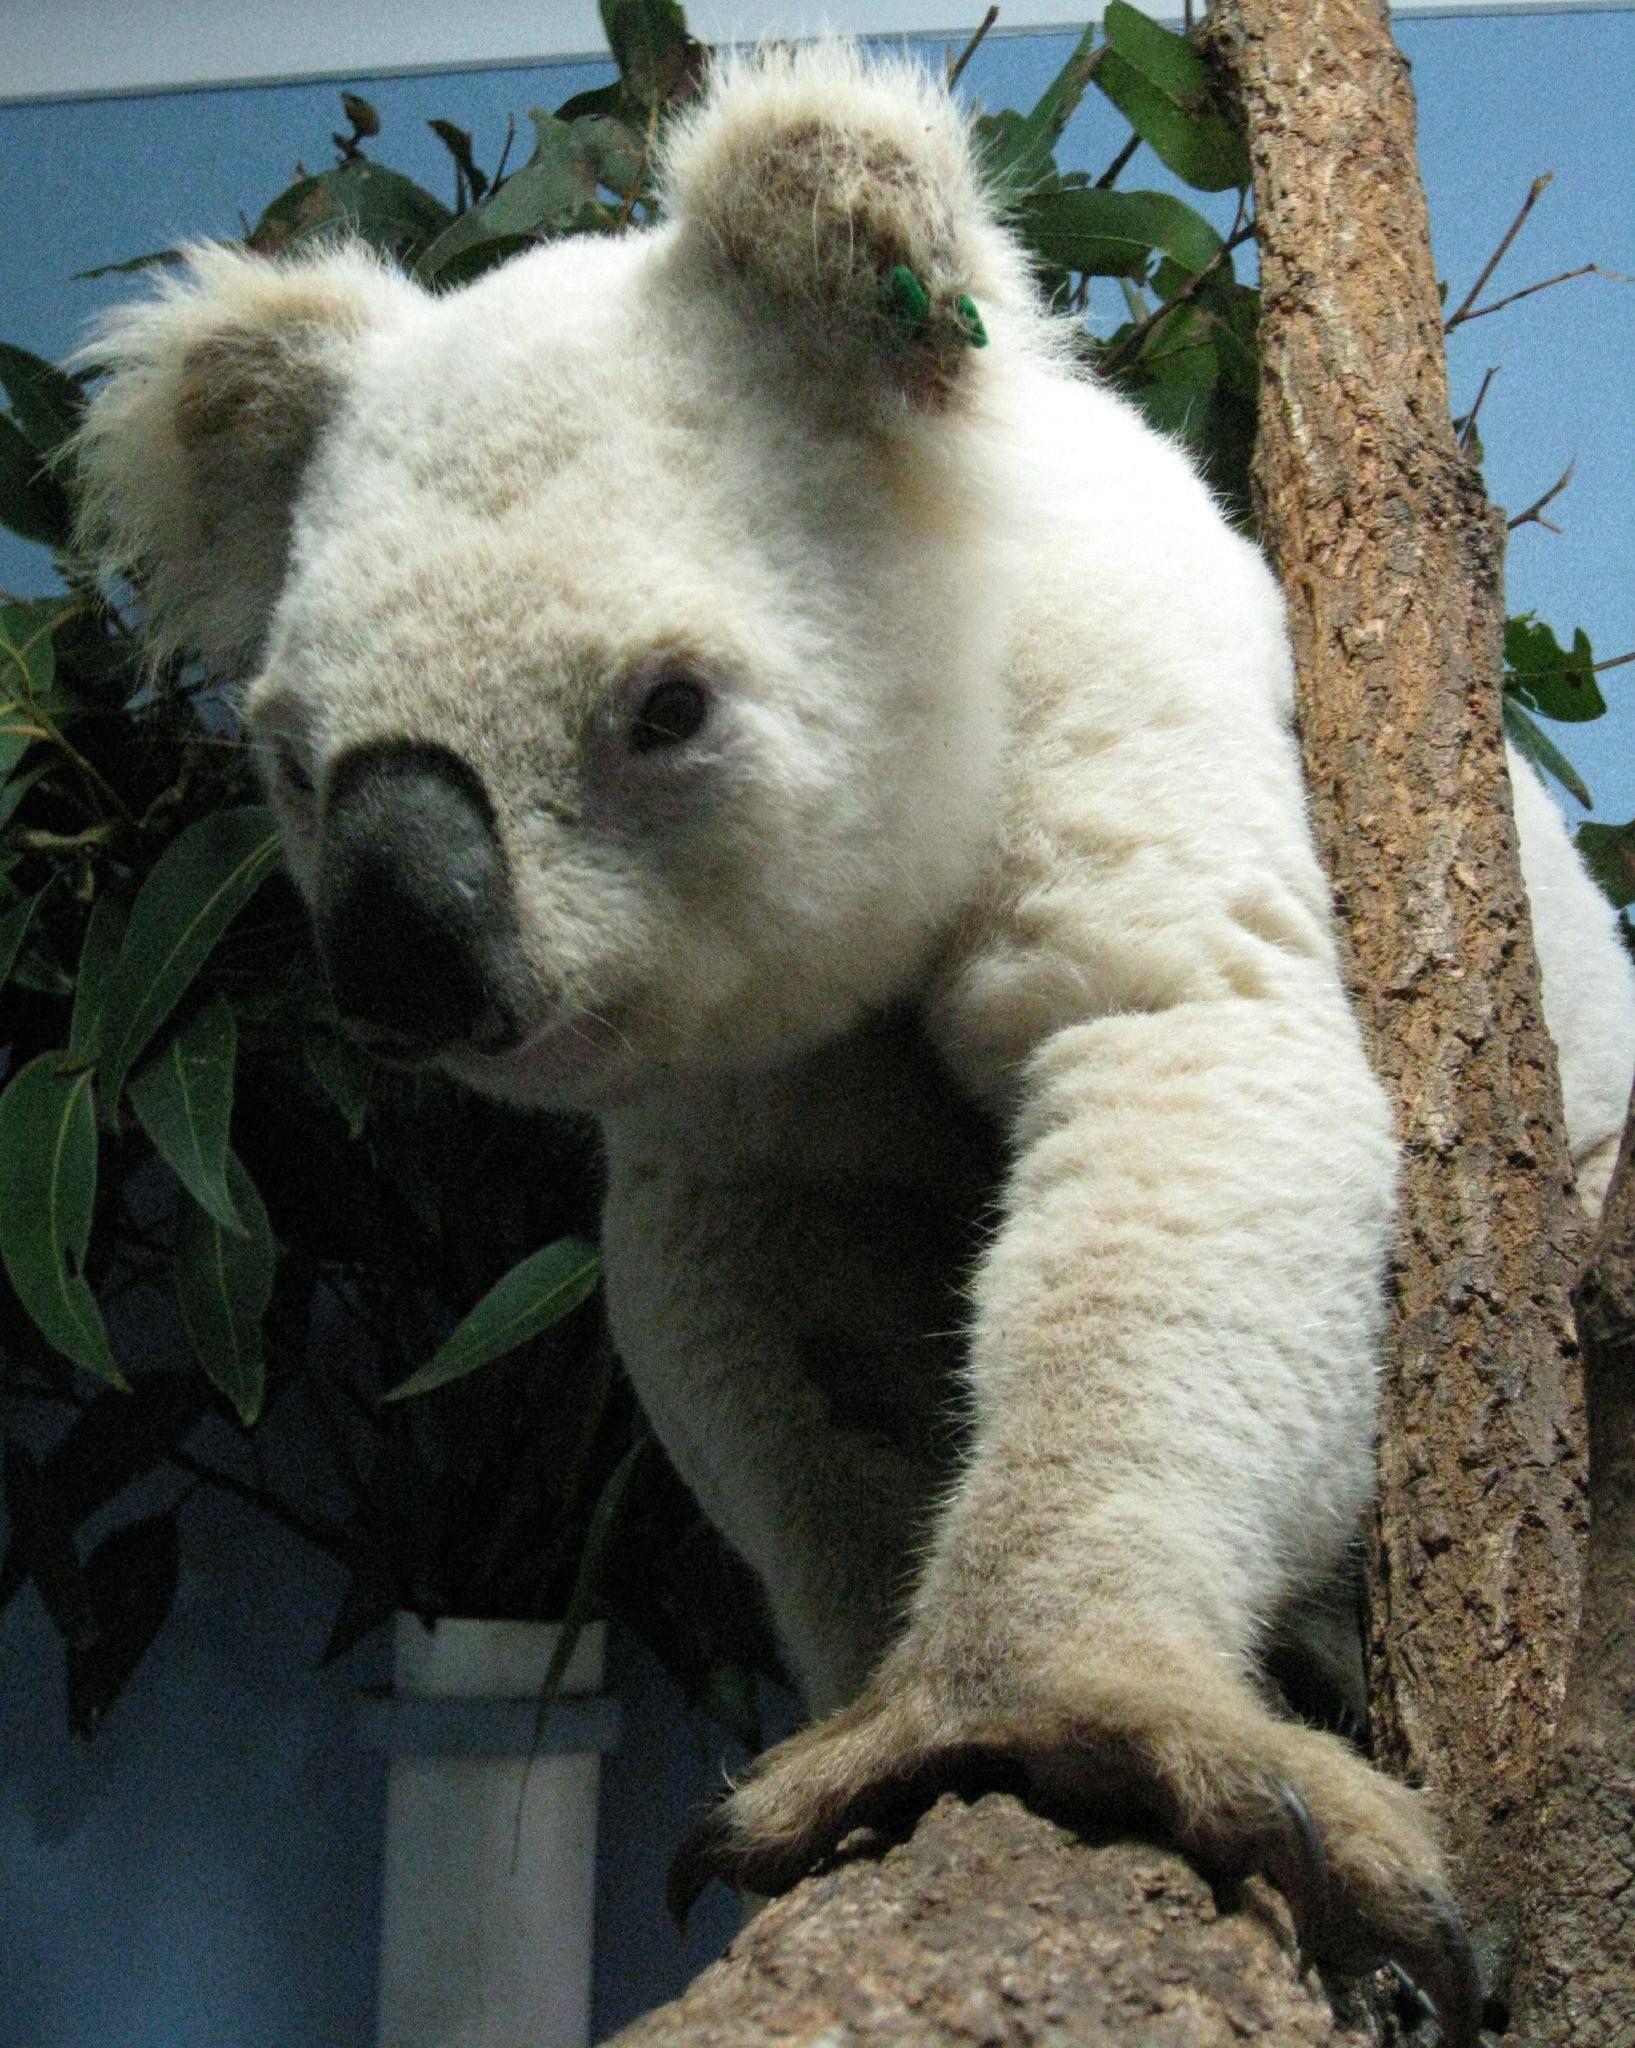 Rare white koala. Australia Koalas sleep for 20 hours a